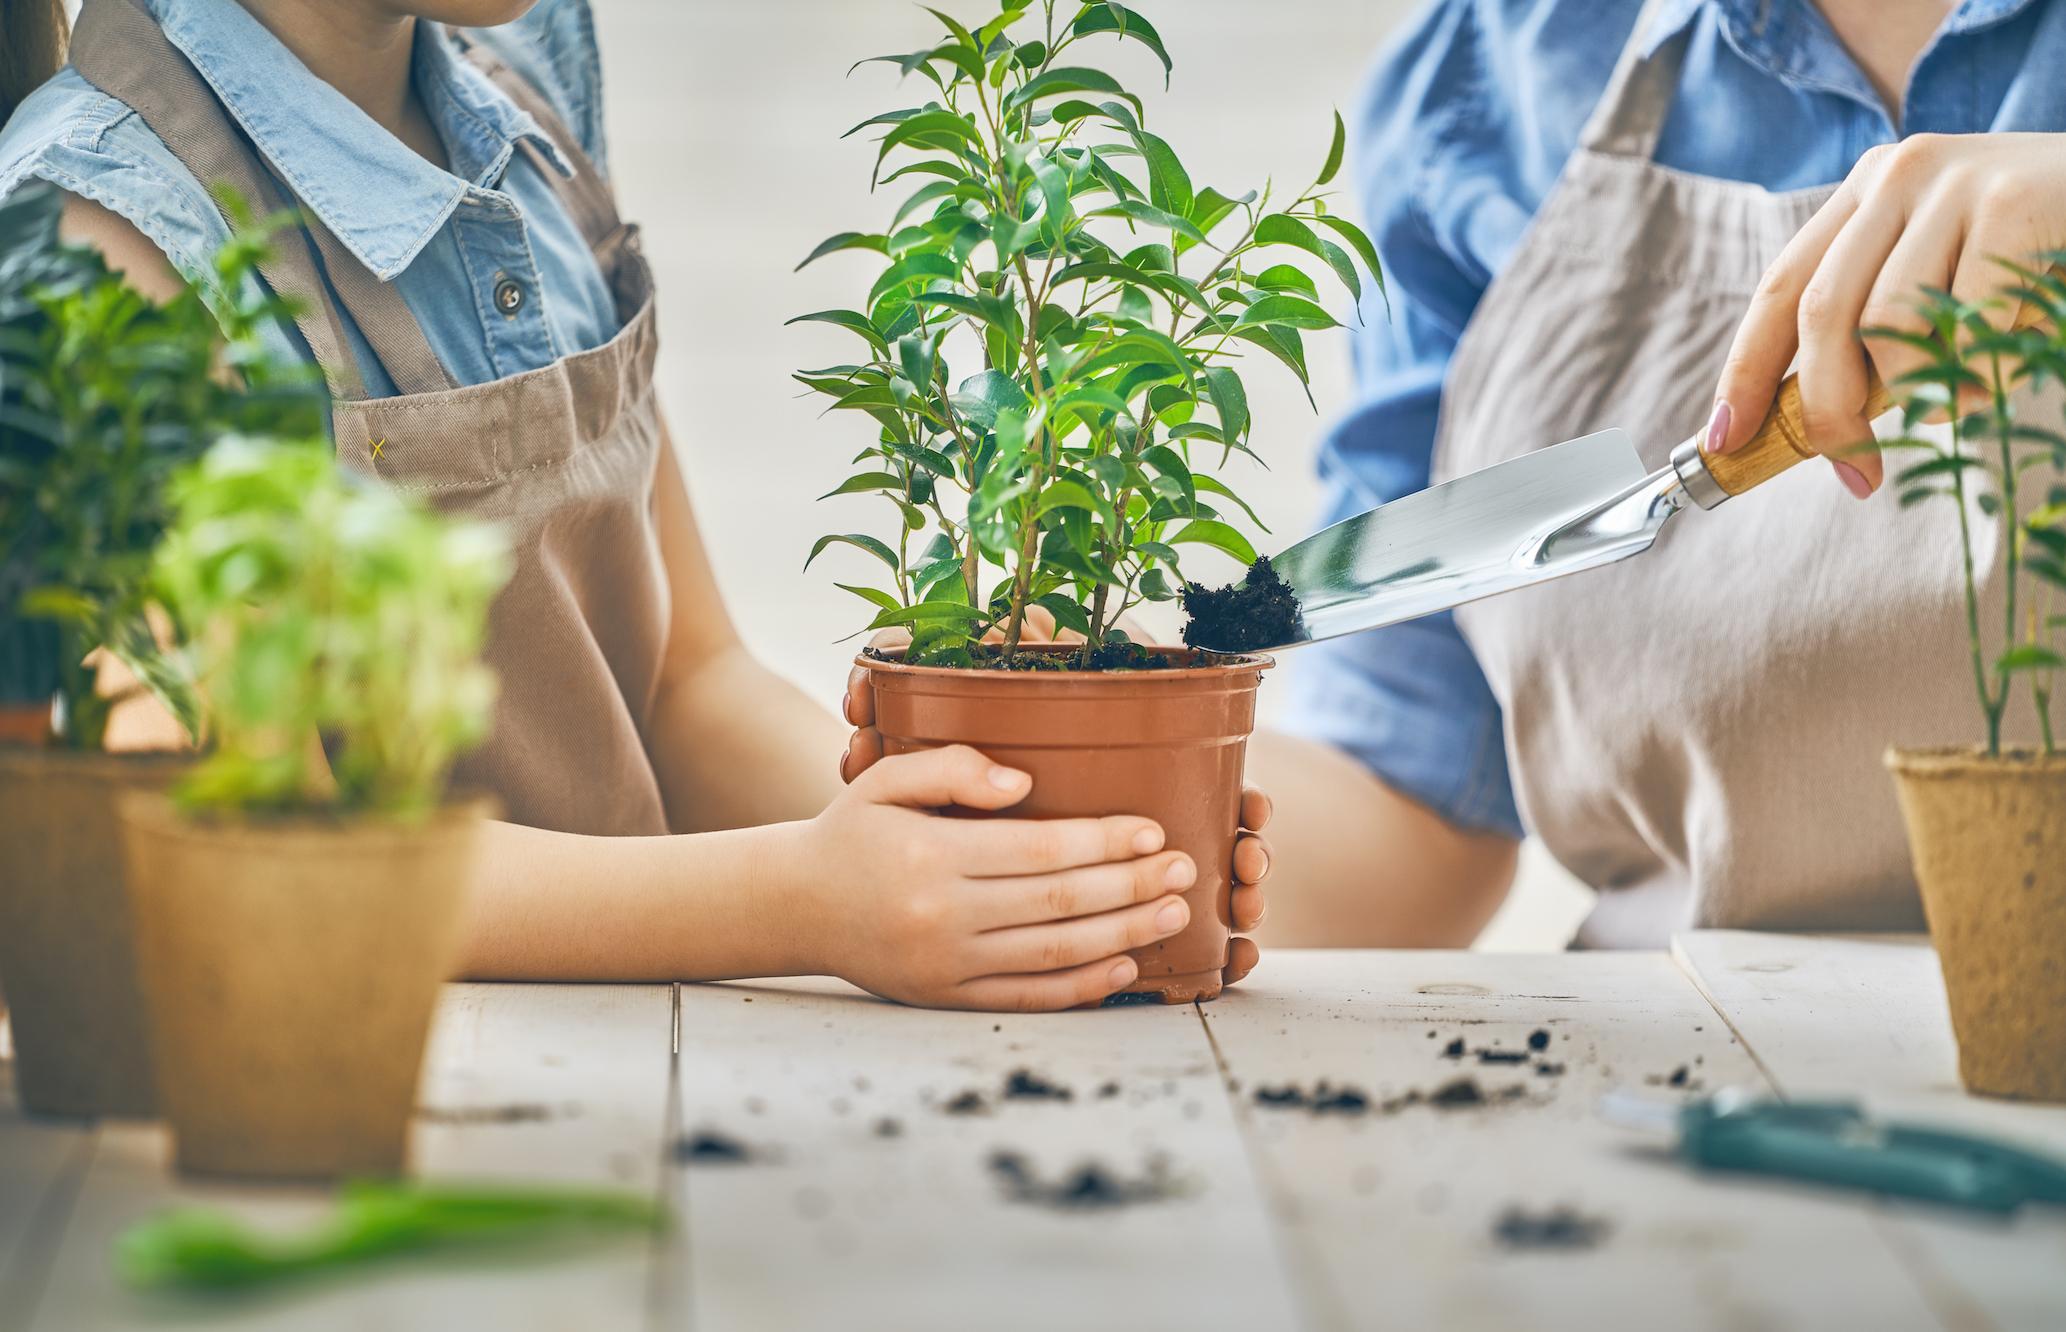 Image result for การ ปลูก ไม้ ดอกไม้ ประดับ